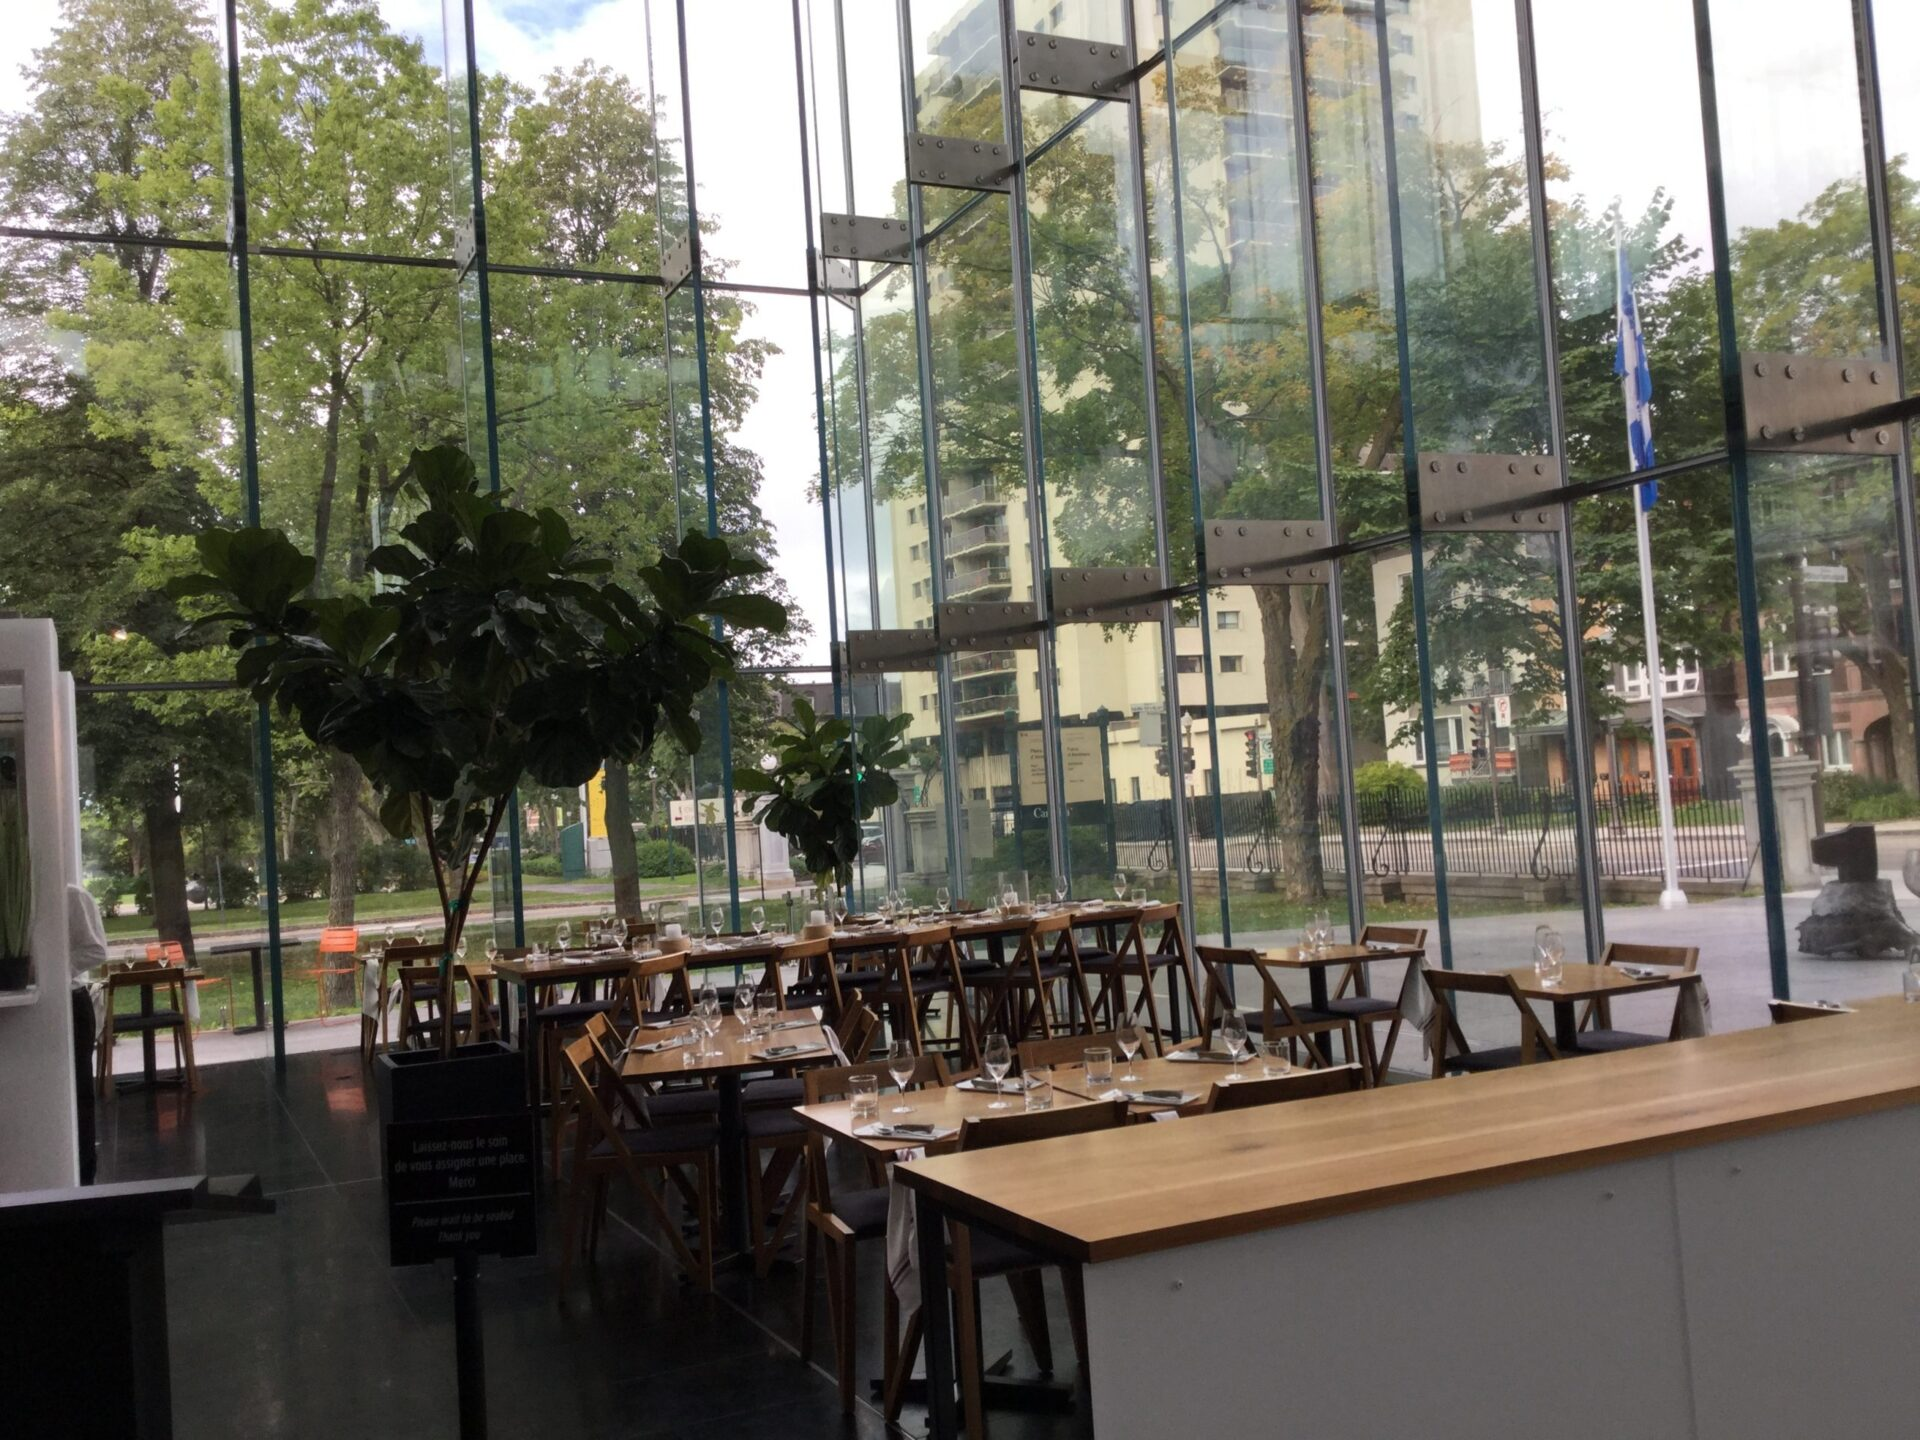 Salle à manger du Musée